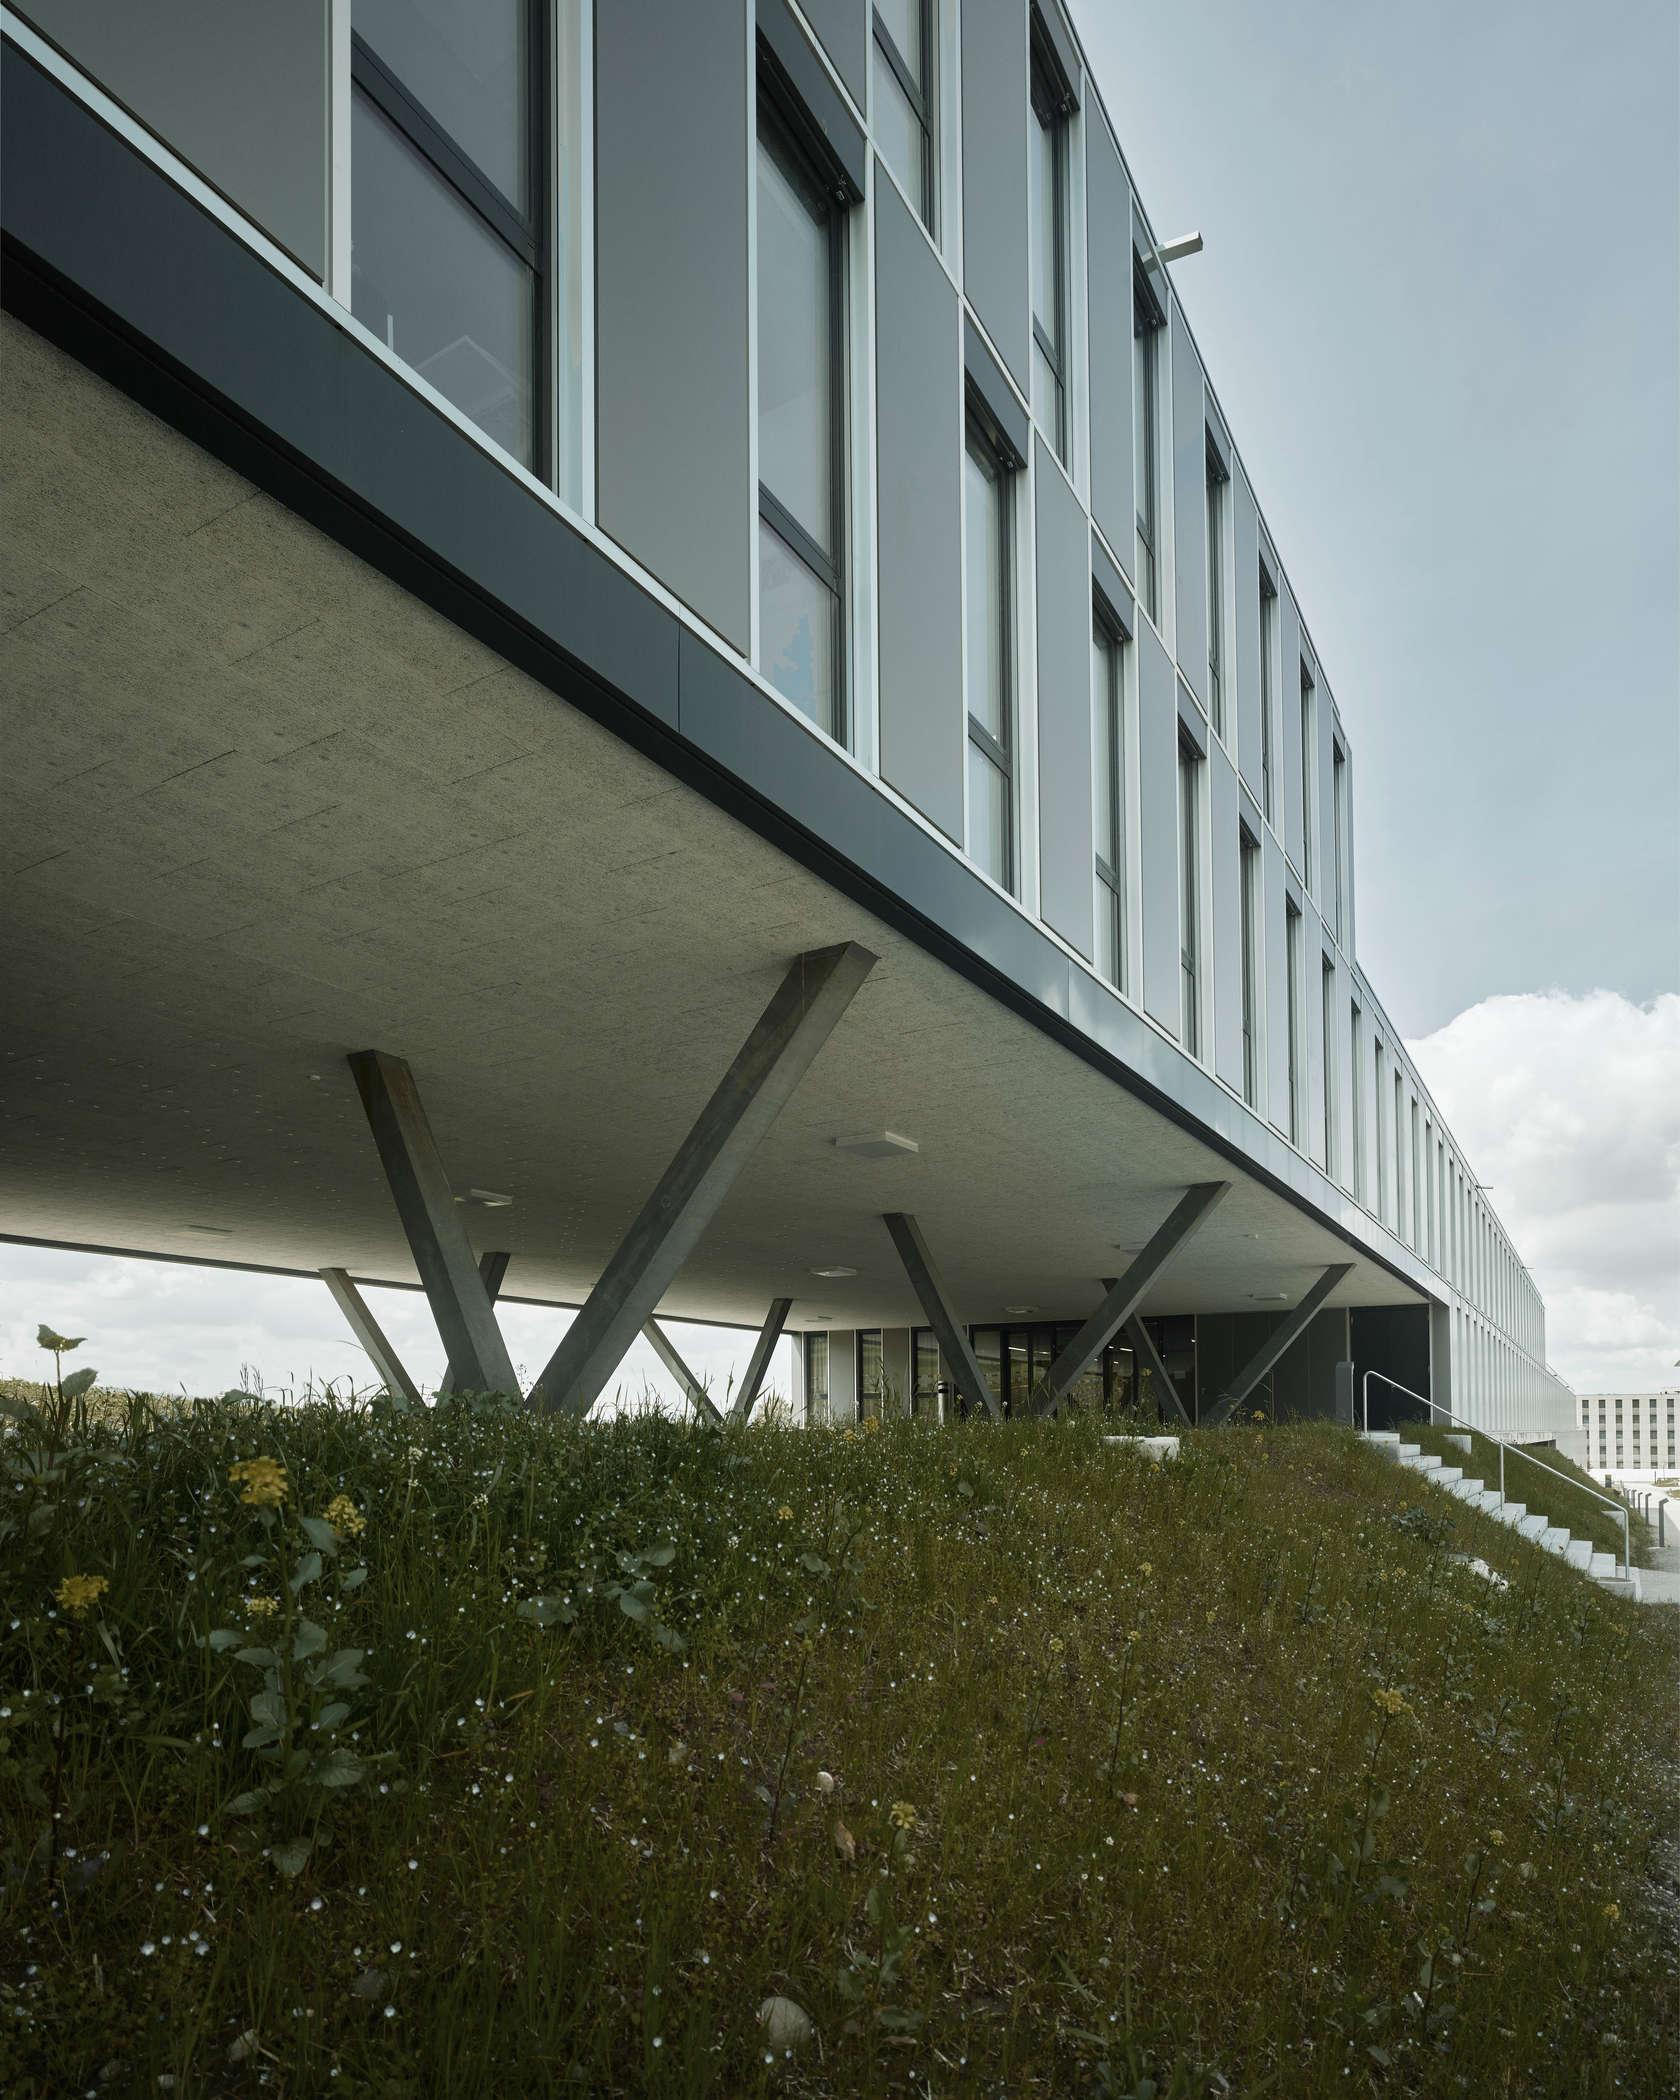 Hcp office and seminar building eth zurich architizer for Architecture zurich